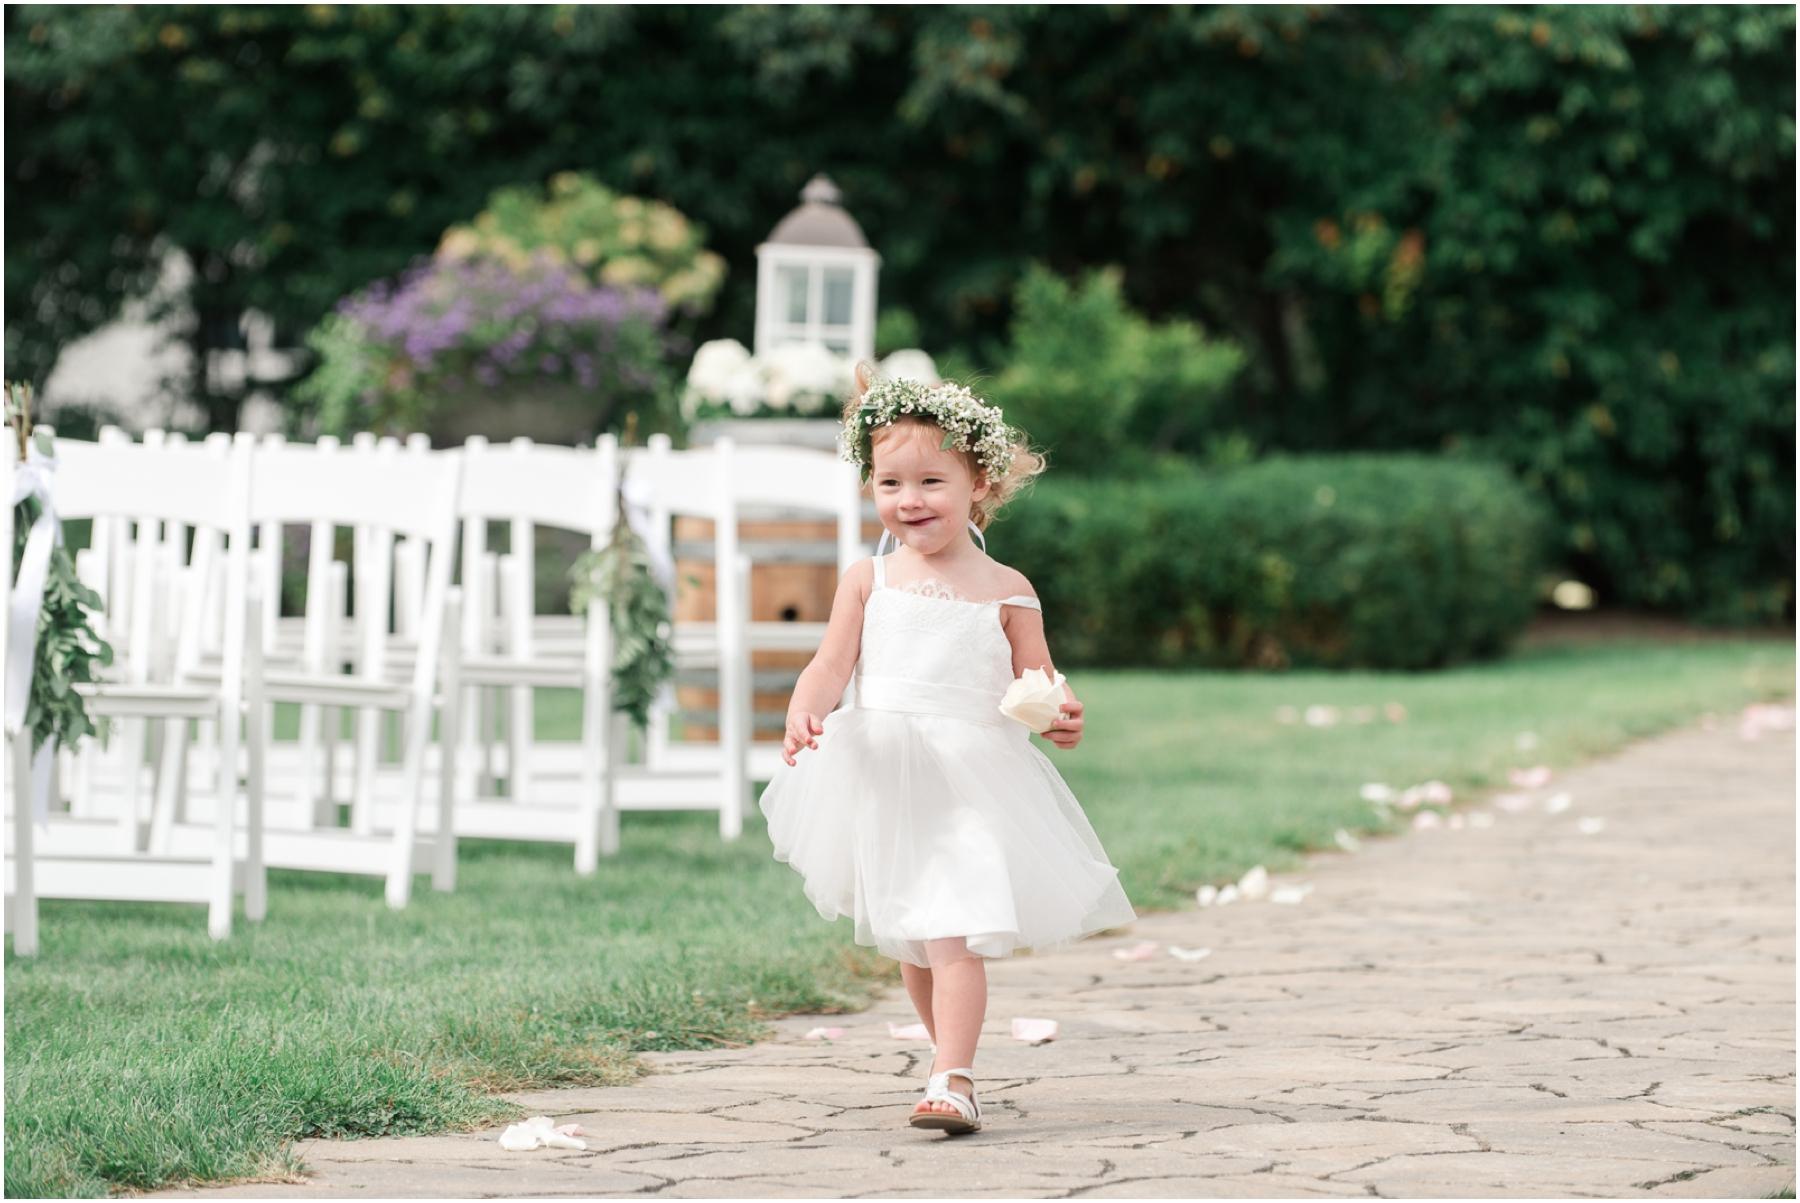 Bloom Field Gardens Wedding Precious Photography Katherine & Chris_039